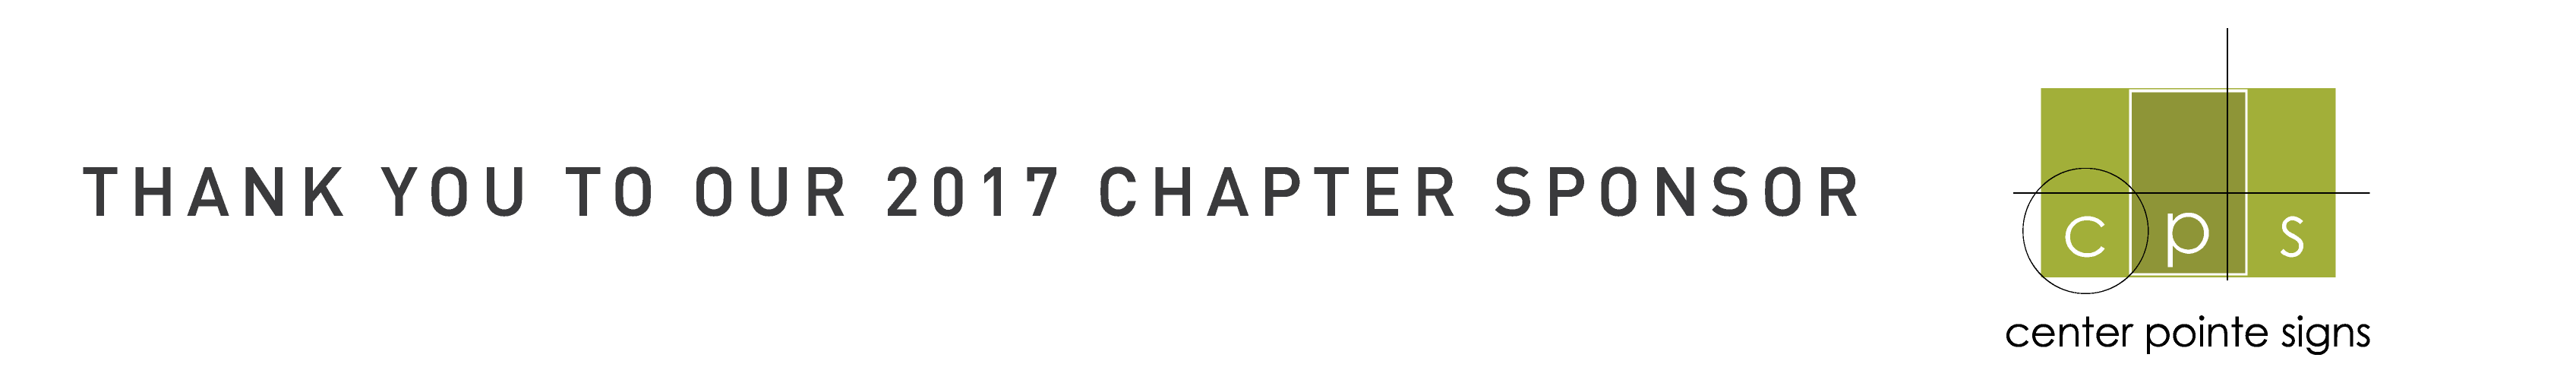 2017 Sponsor